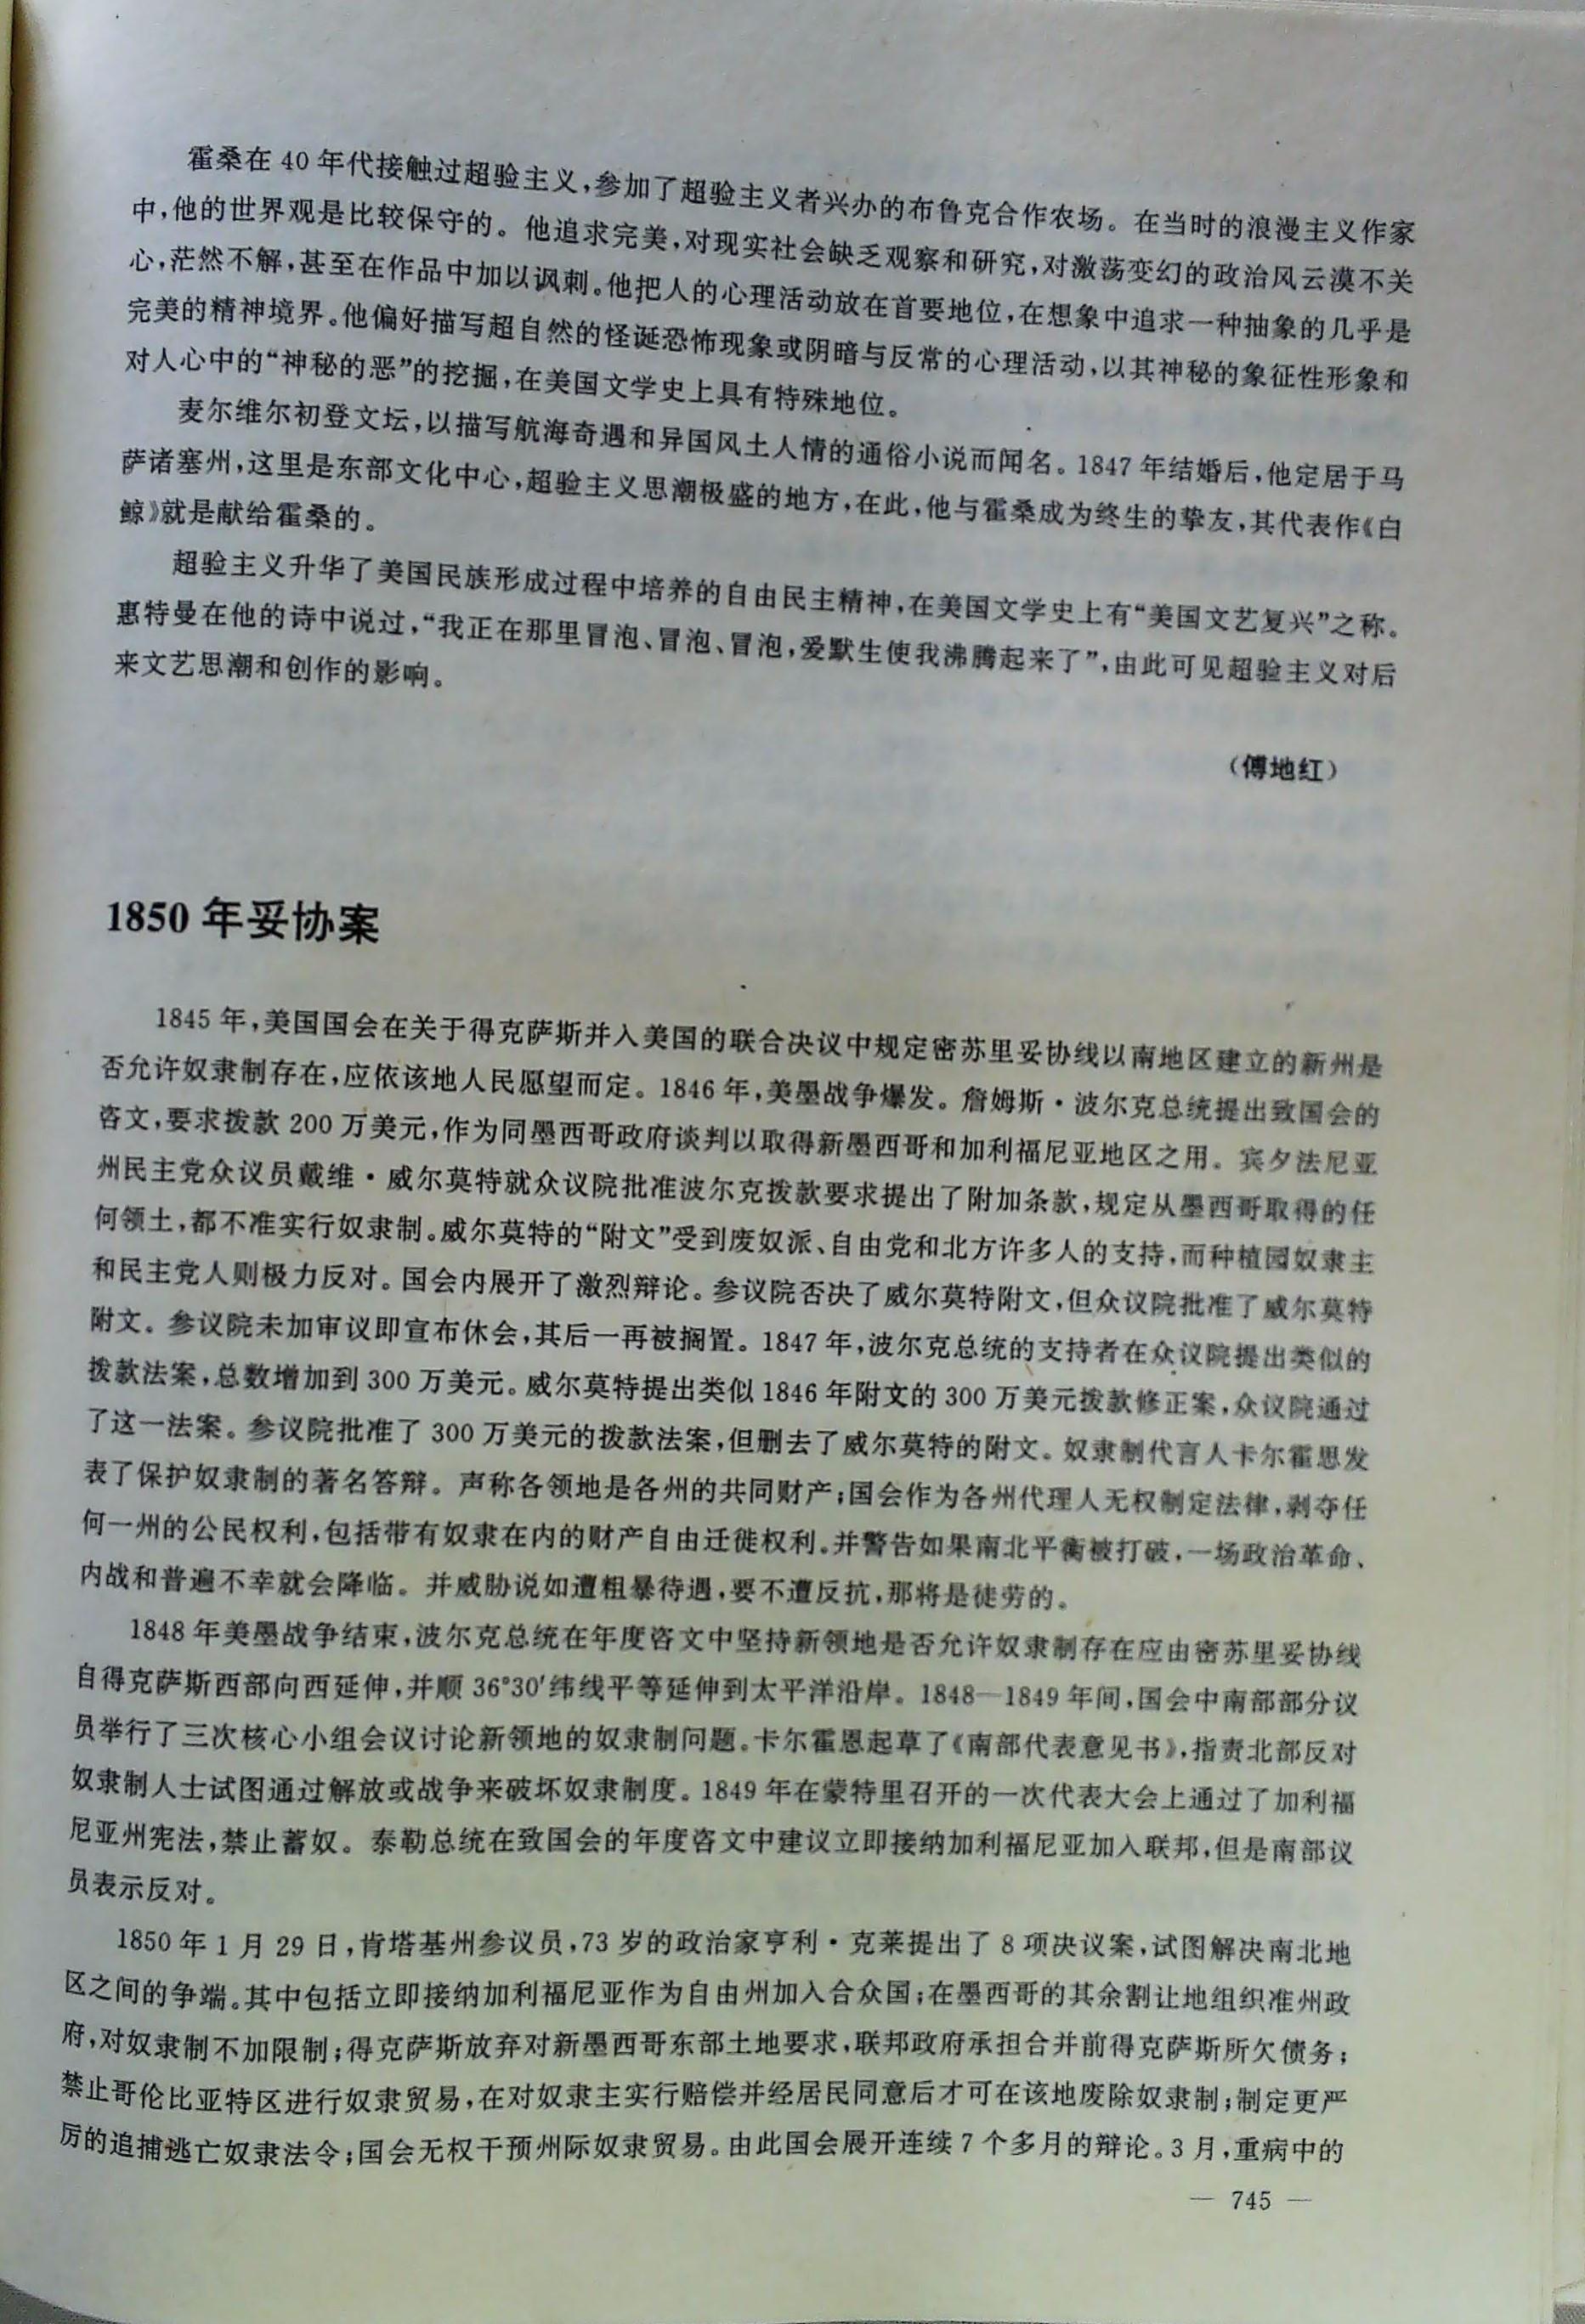 1 IMG1228.jpg